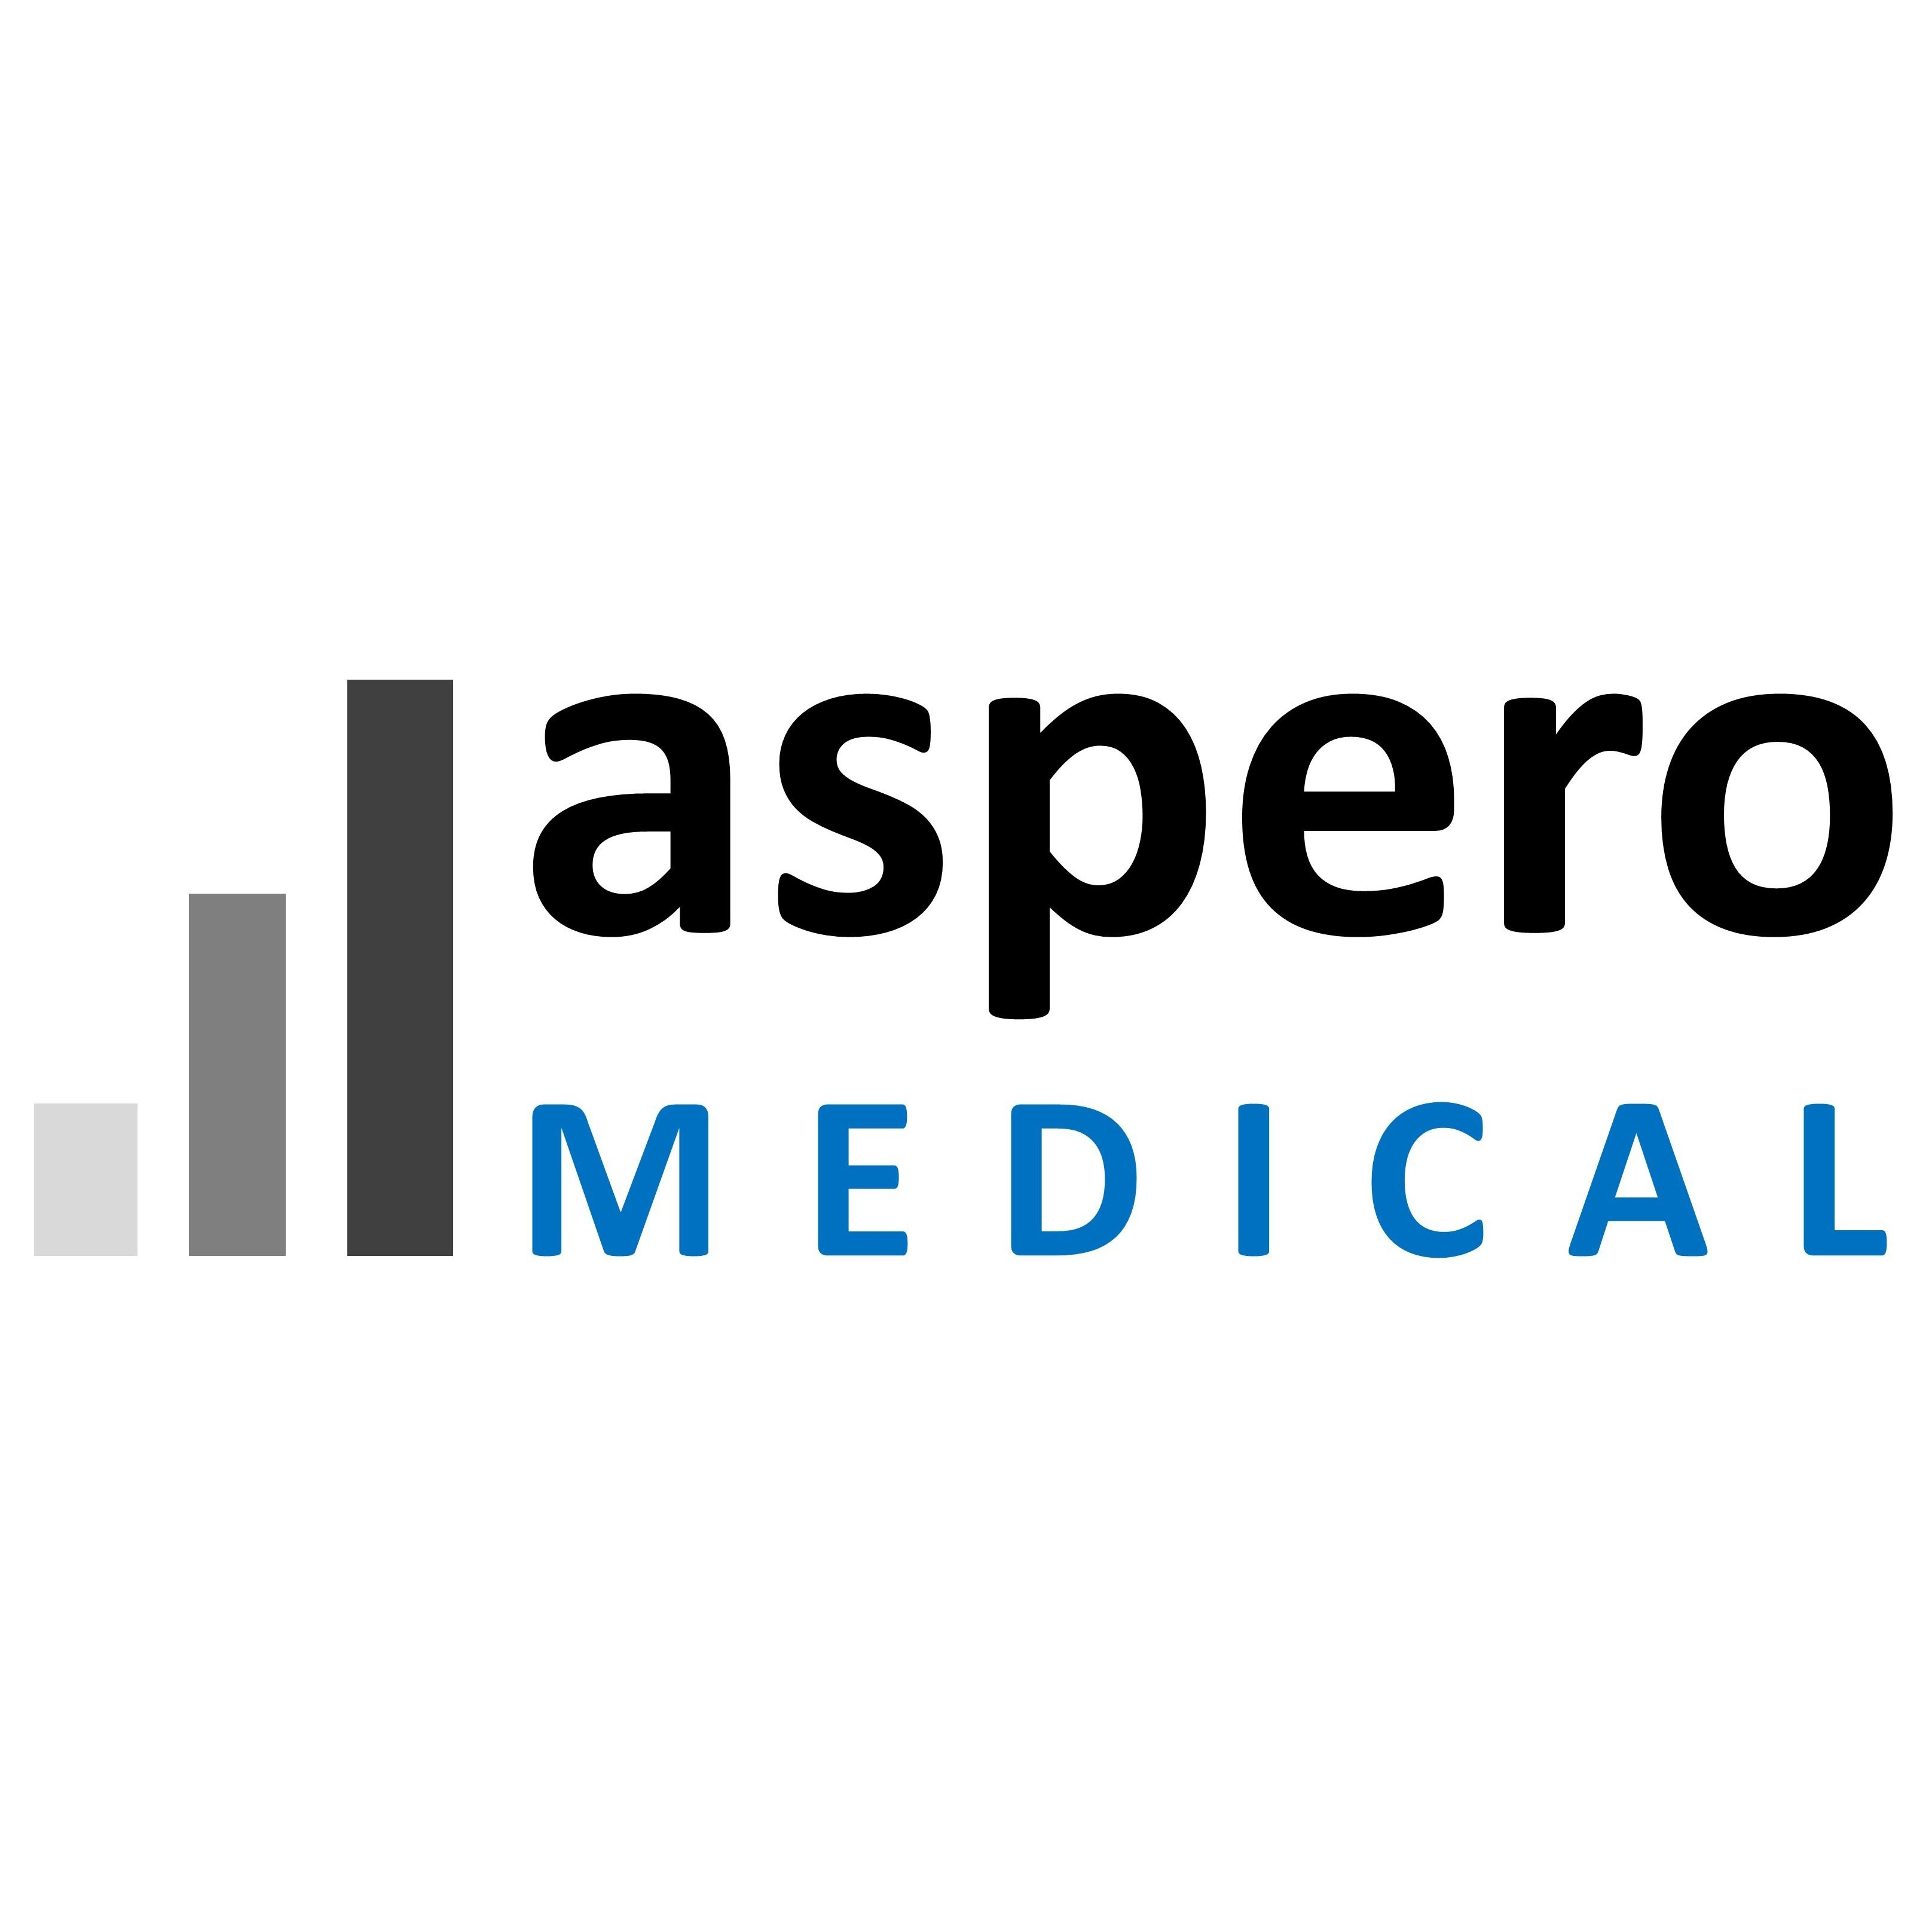 Aspero Medical